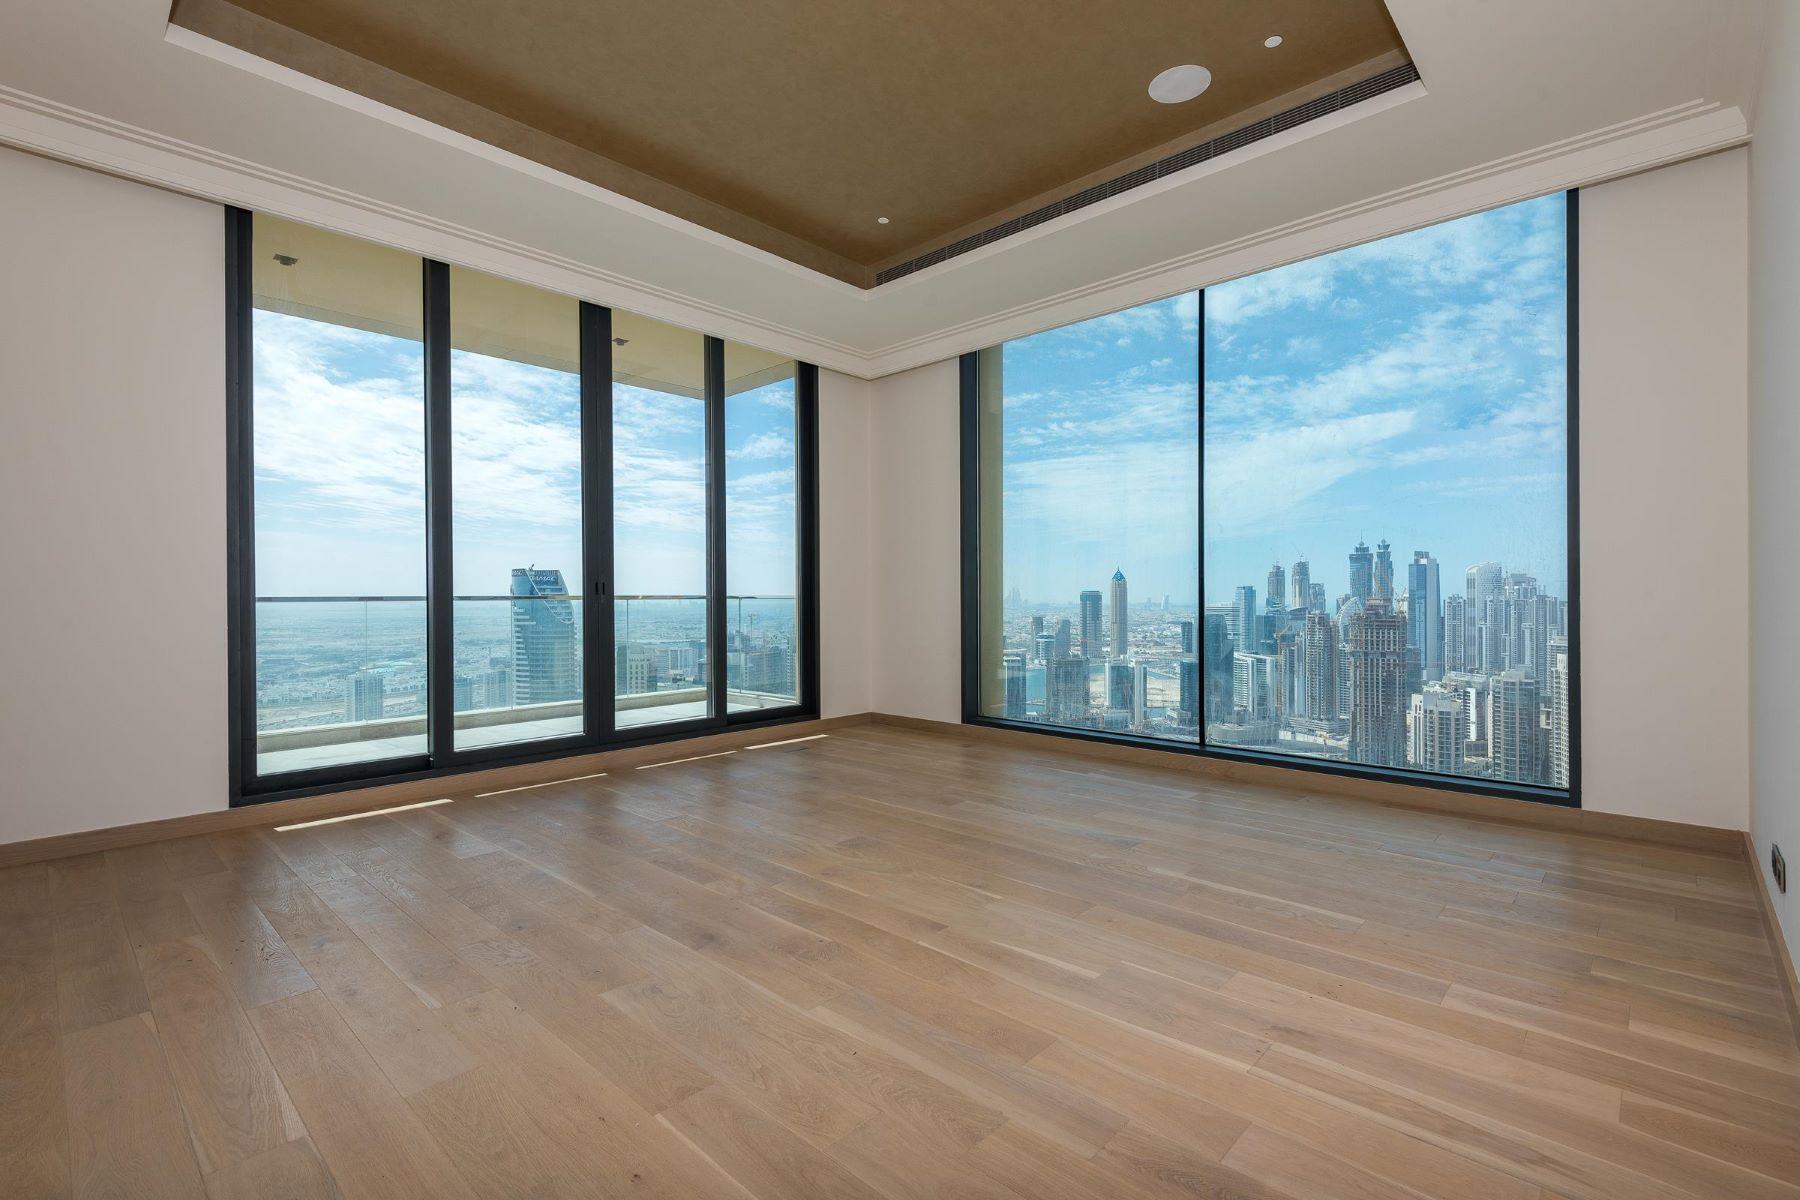 Apartments for Sale at New Luxurious Penthouse Downtown Dubai. Dubai, Dubai United Arab Emirates